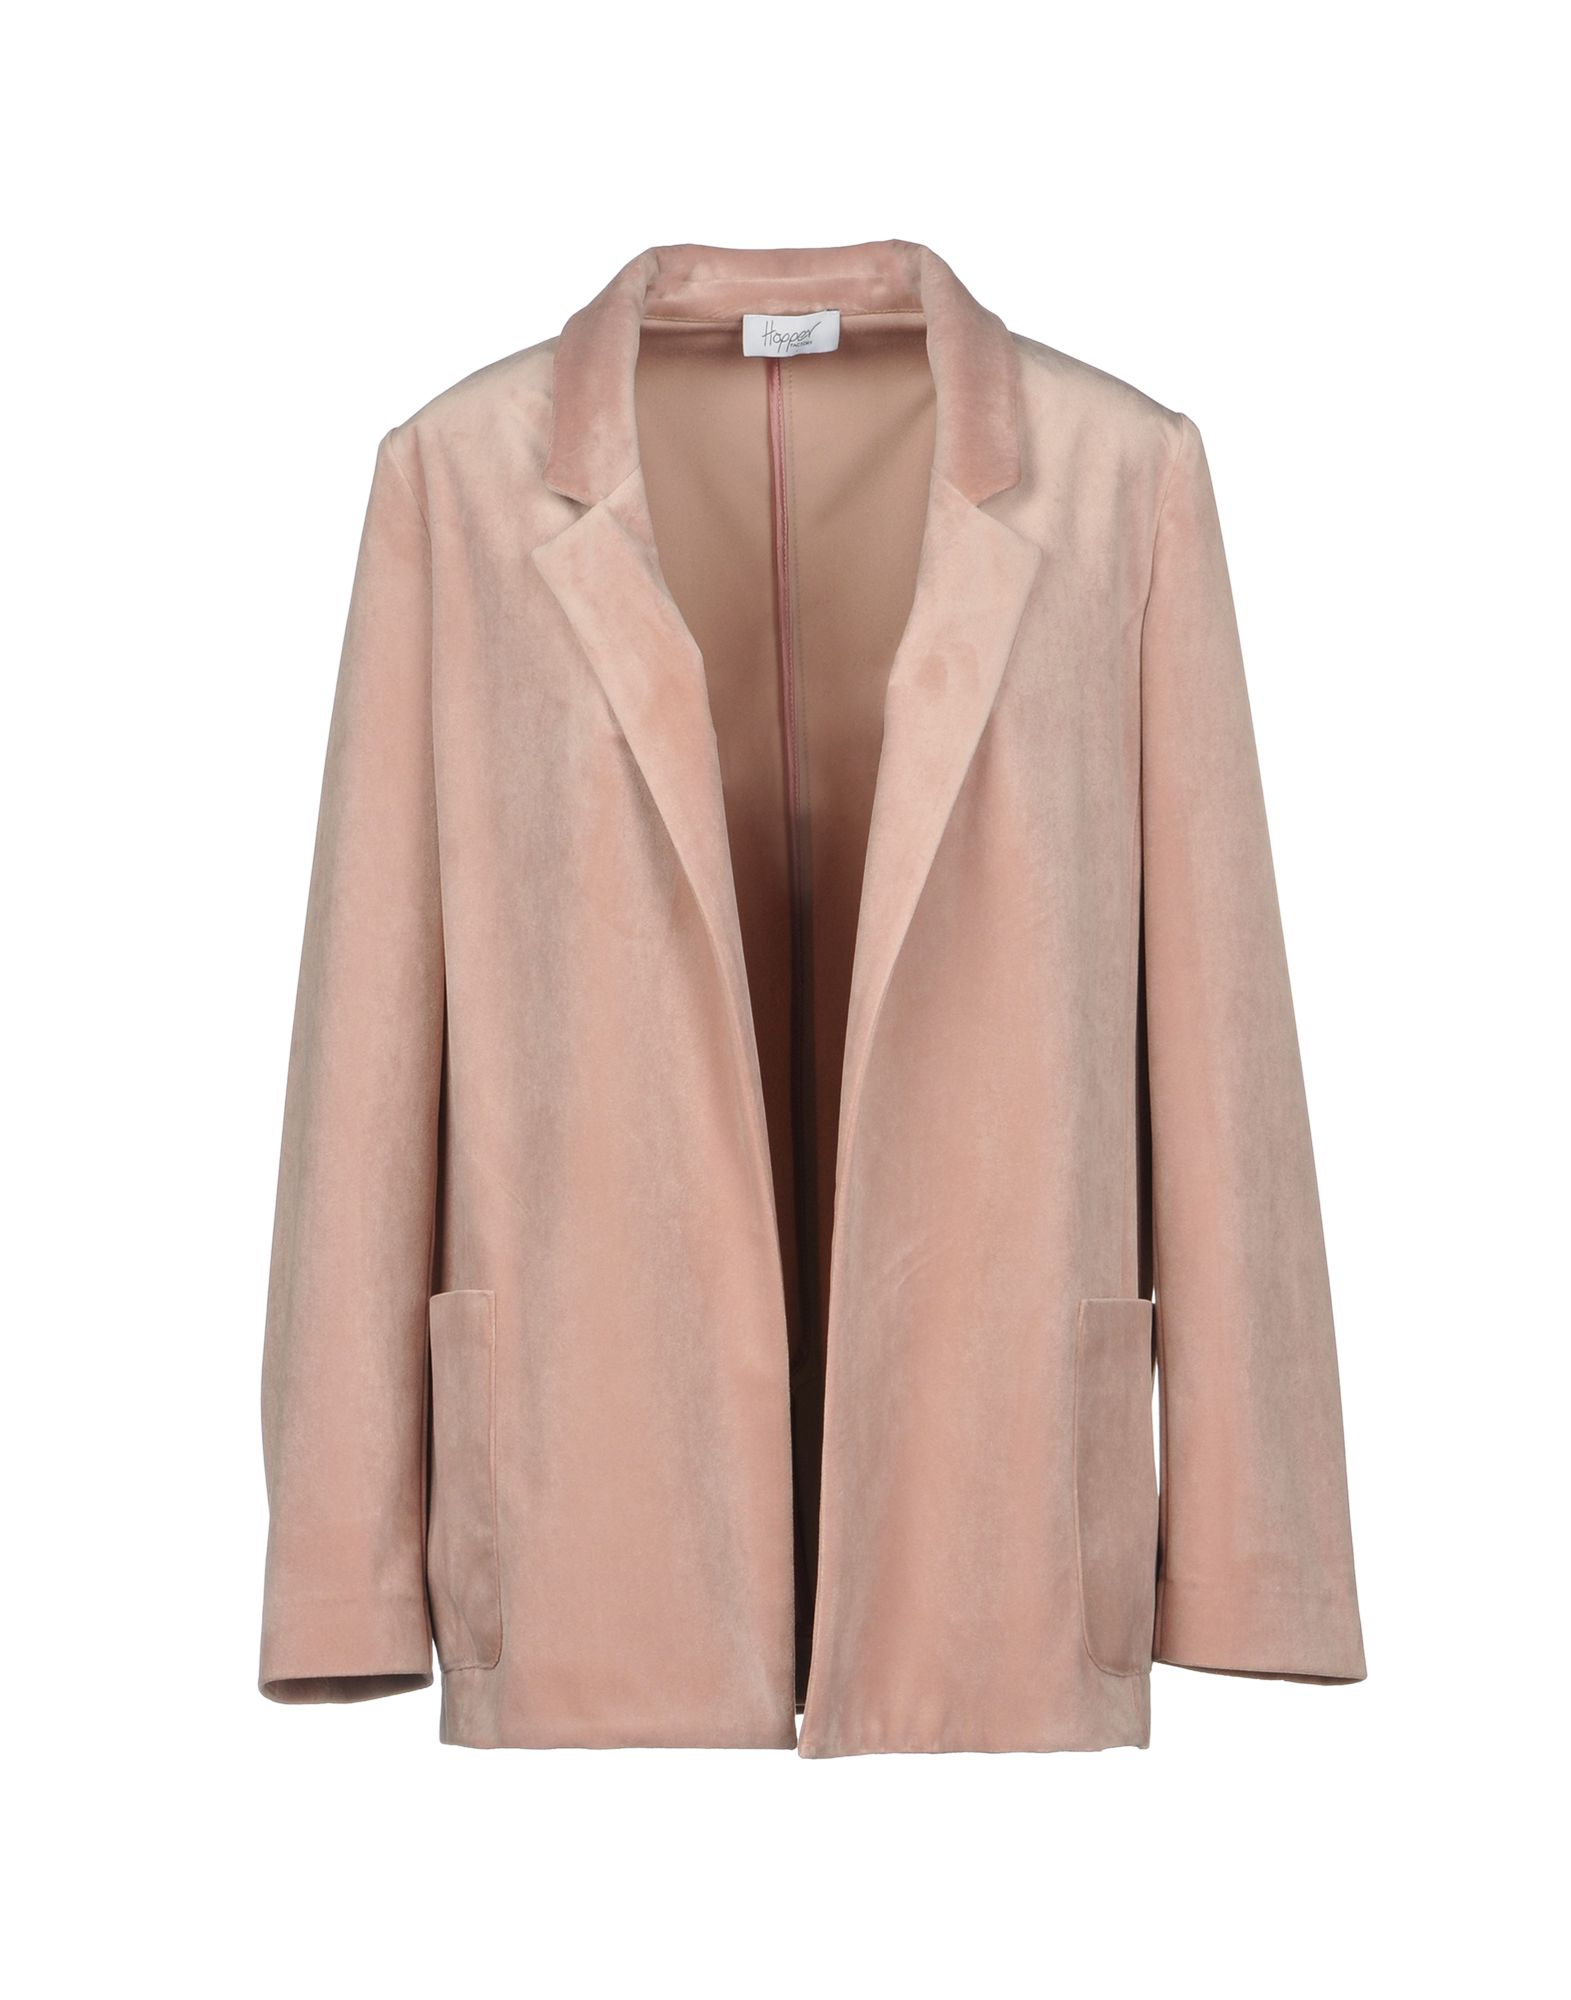 HOPPER Blazer in Light Pink